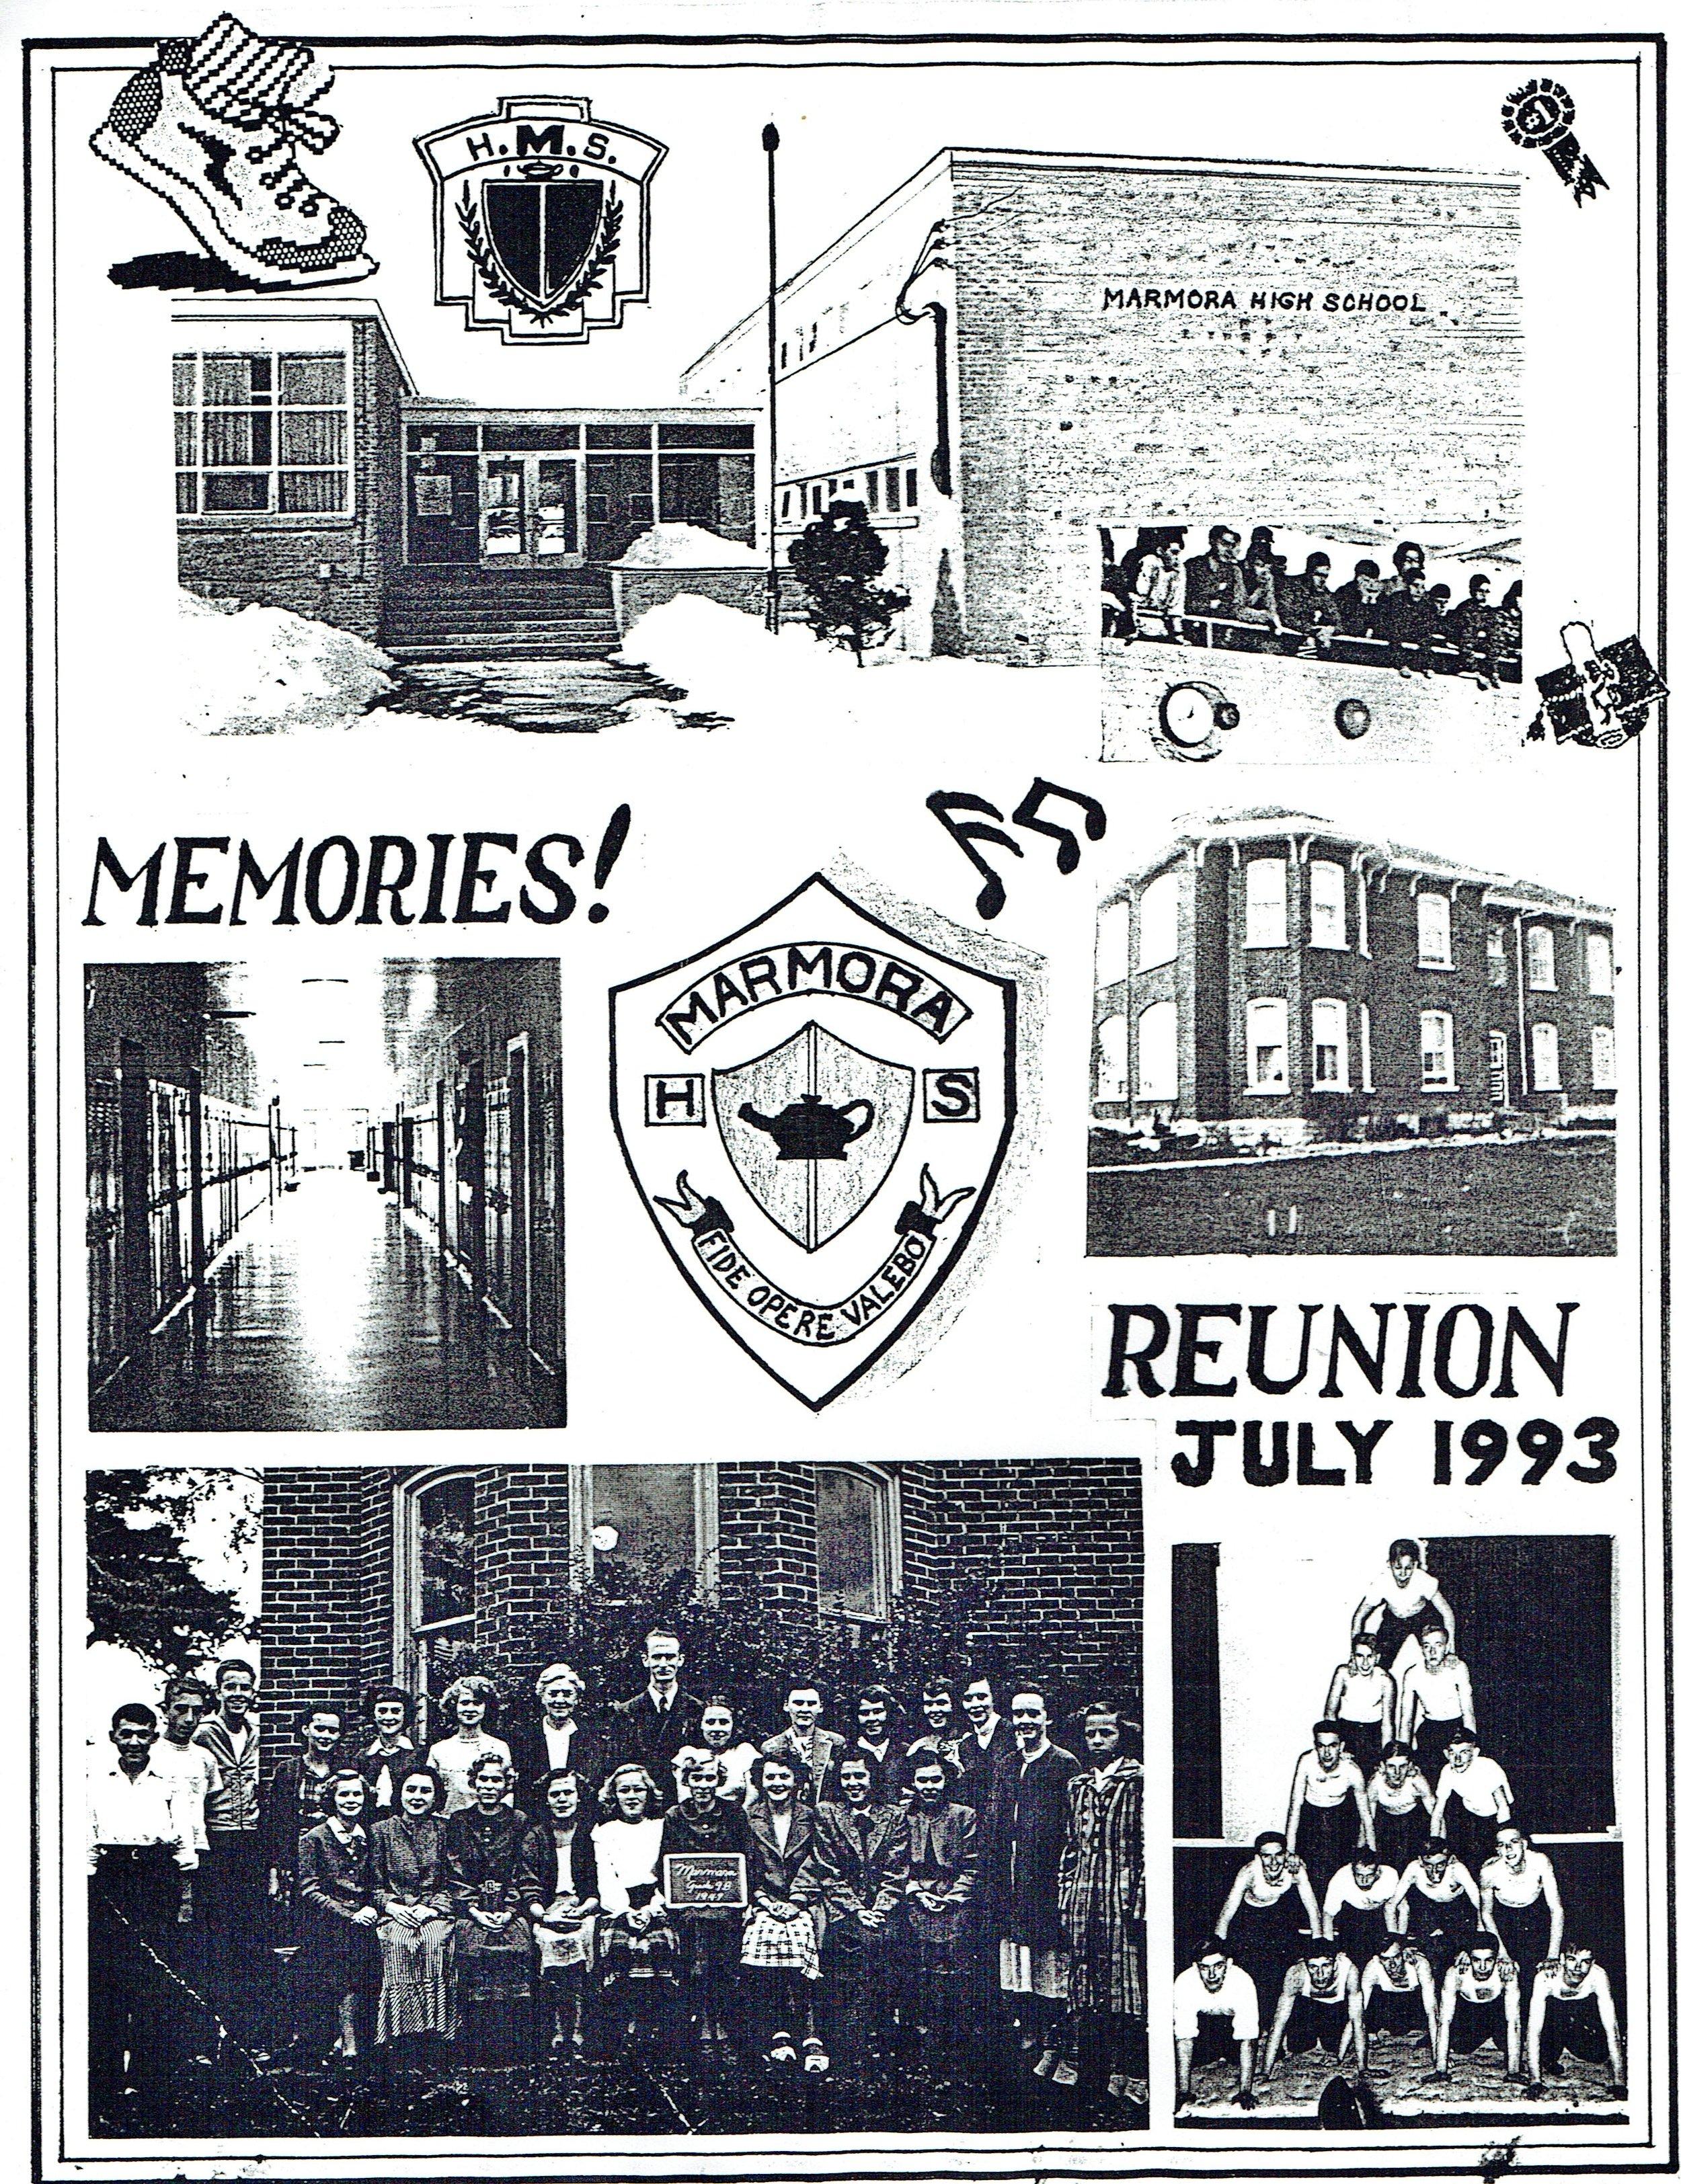 1993 High school reunion.jpg